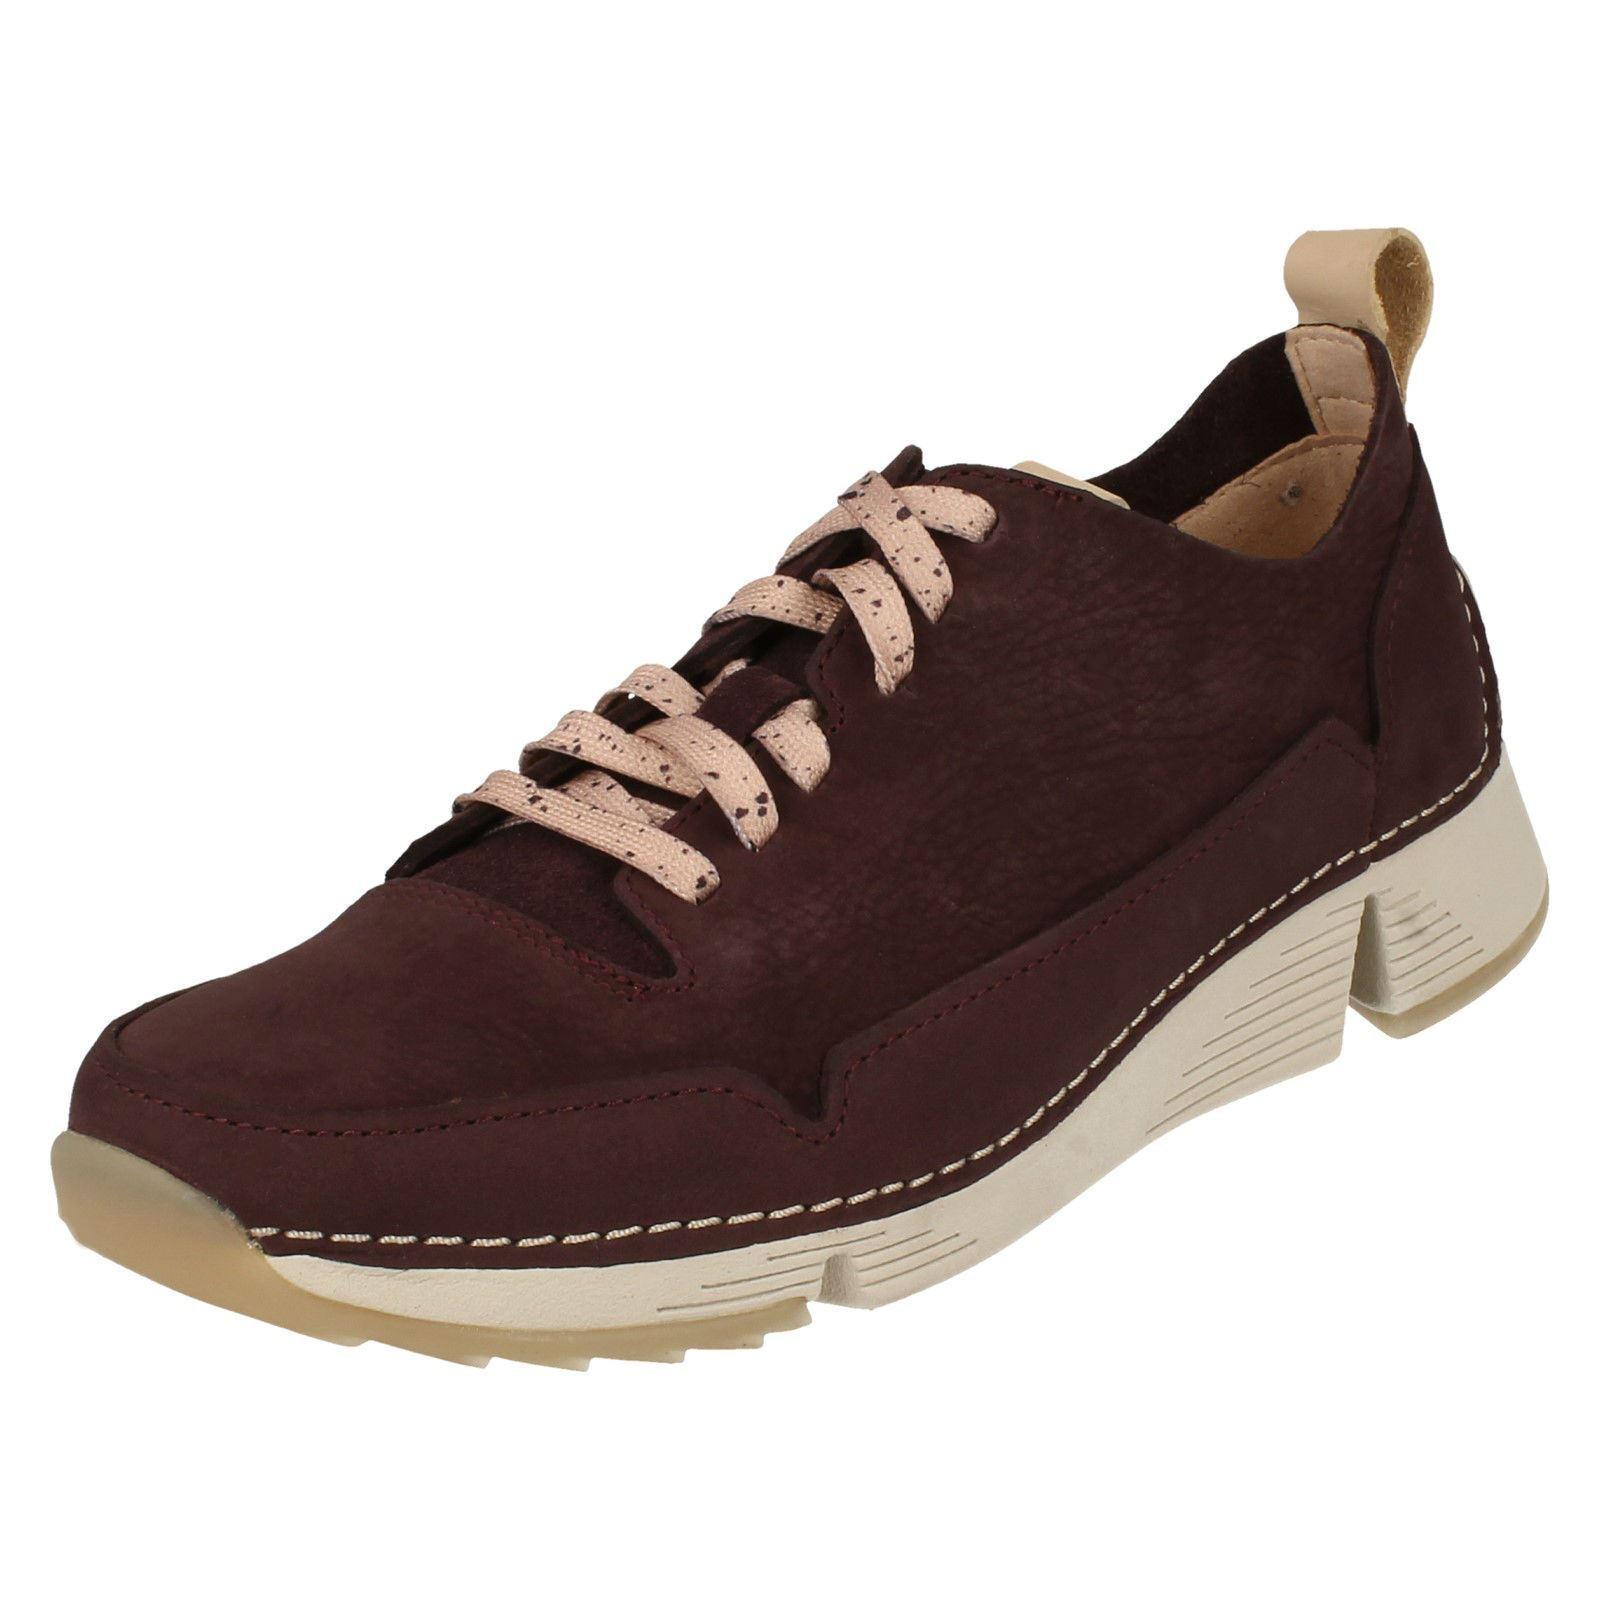 Sandalo Sandalo Sandalo Donna Clarks Casual Eleganti Casual Clarks Tri SPARK c4f193   479d47